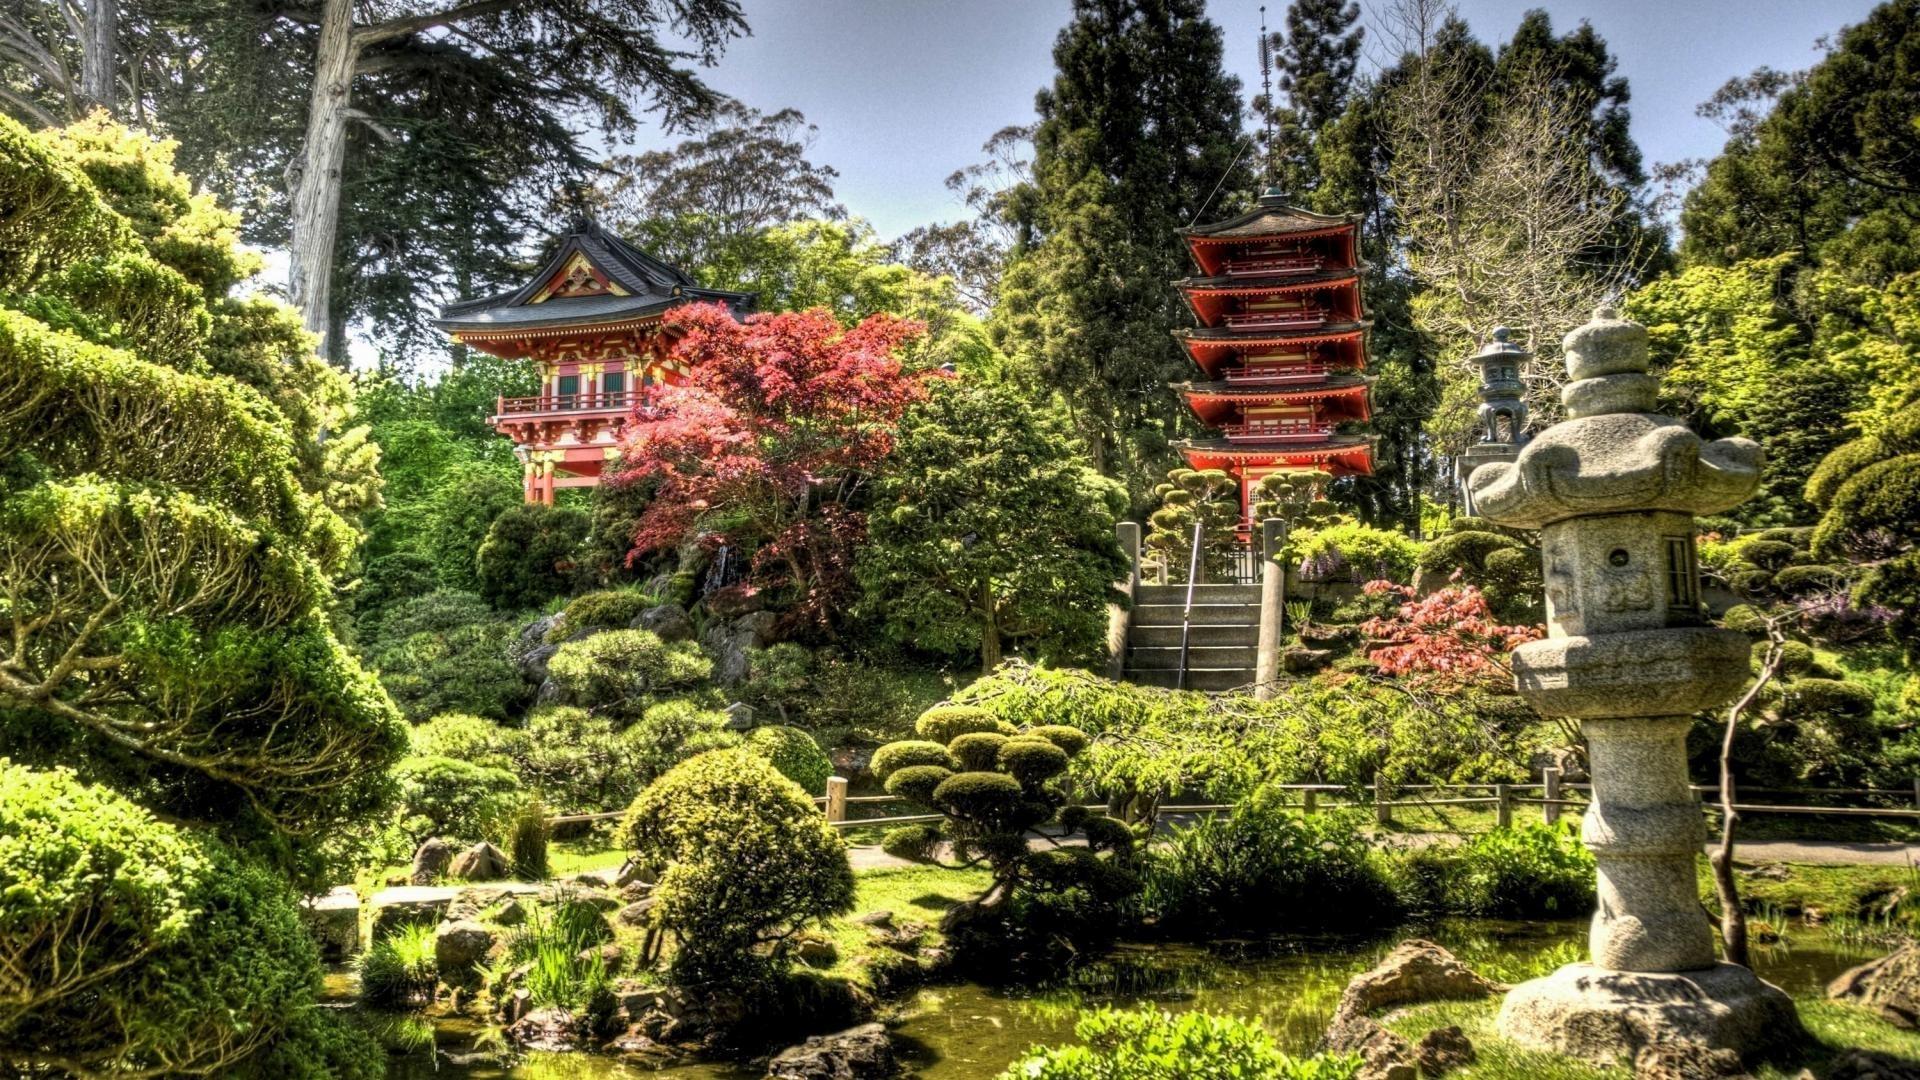 free 1920x1080 japanese tea garden wallpapers full hd 1080p